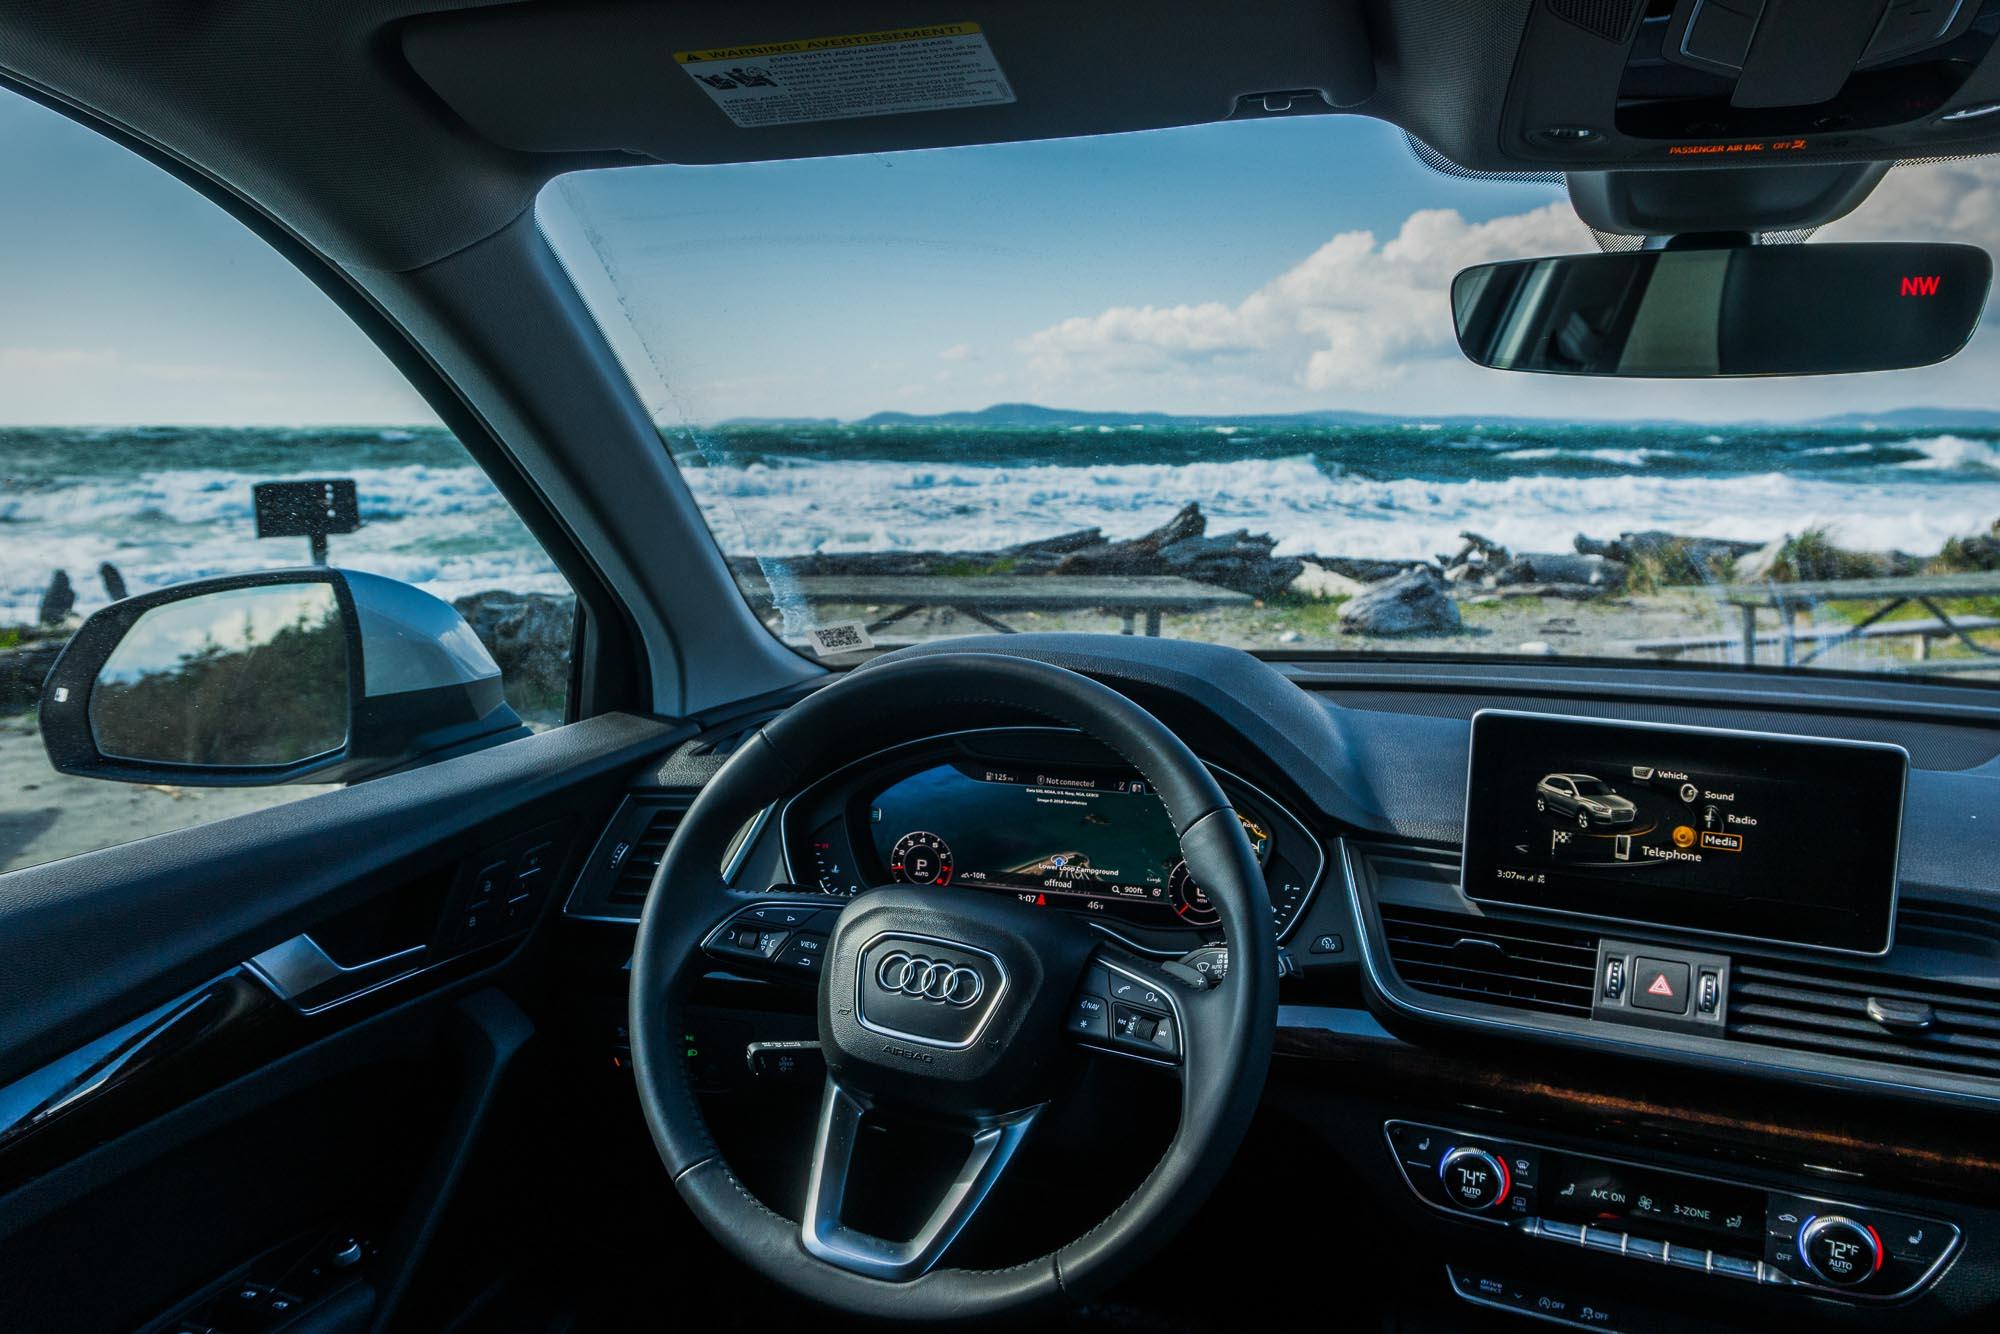 Pratt_Silvercar Audi_024.jpg